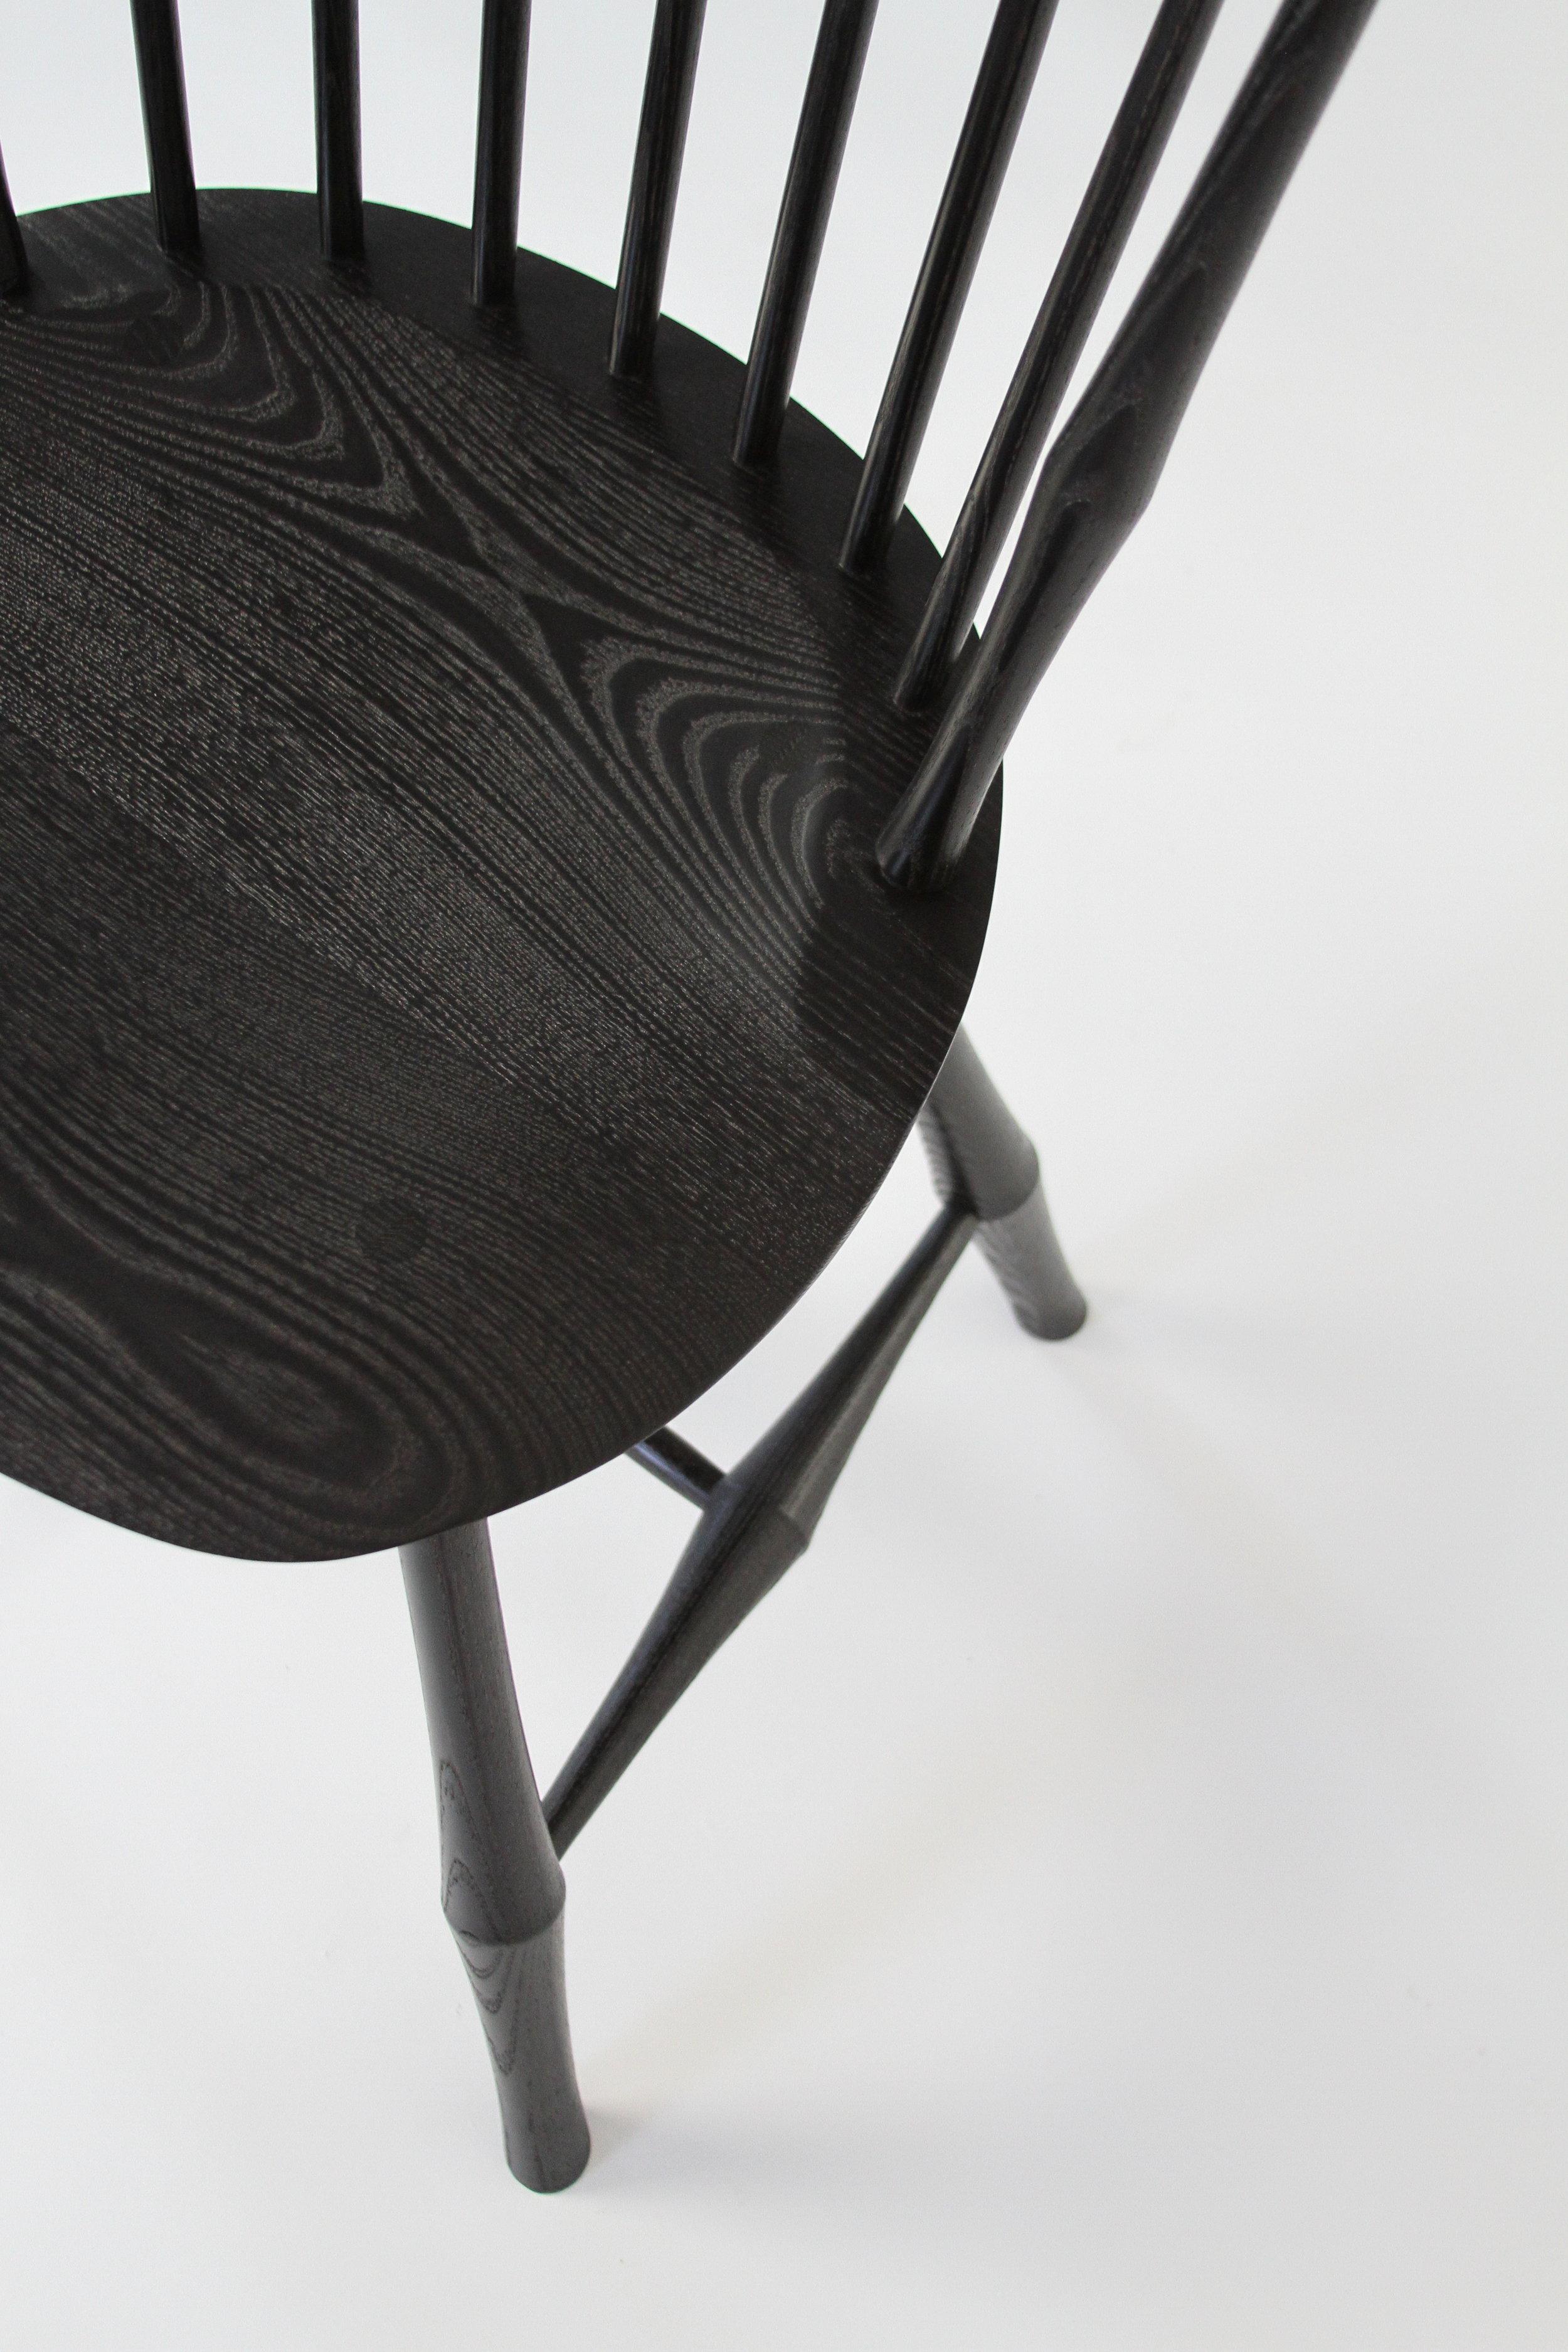 O&G Studio Wayland Highback Side Chair Windsor Chair Ebony Stain Ash